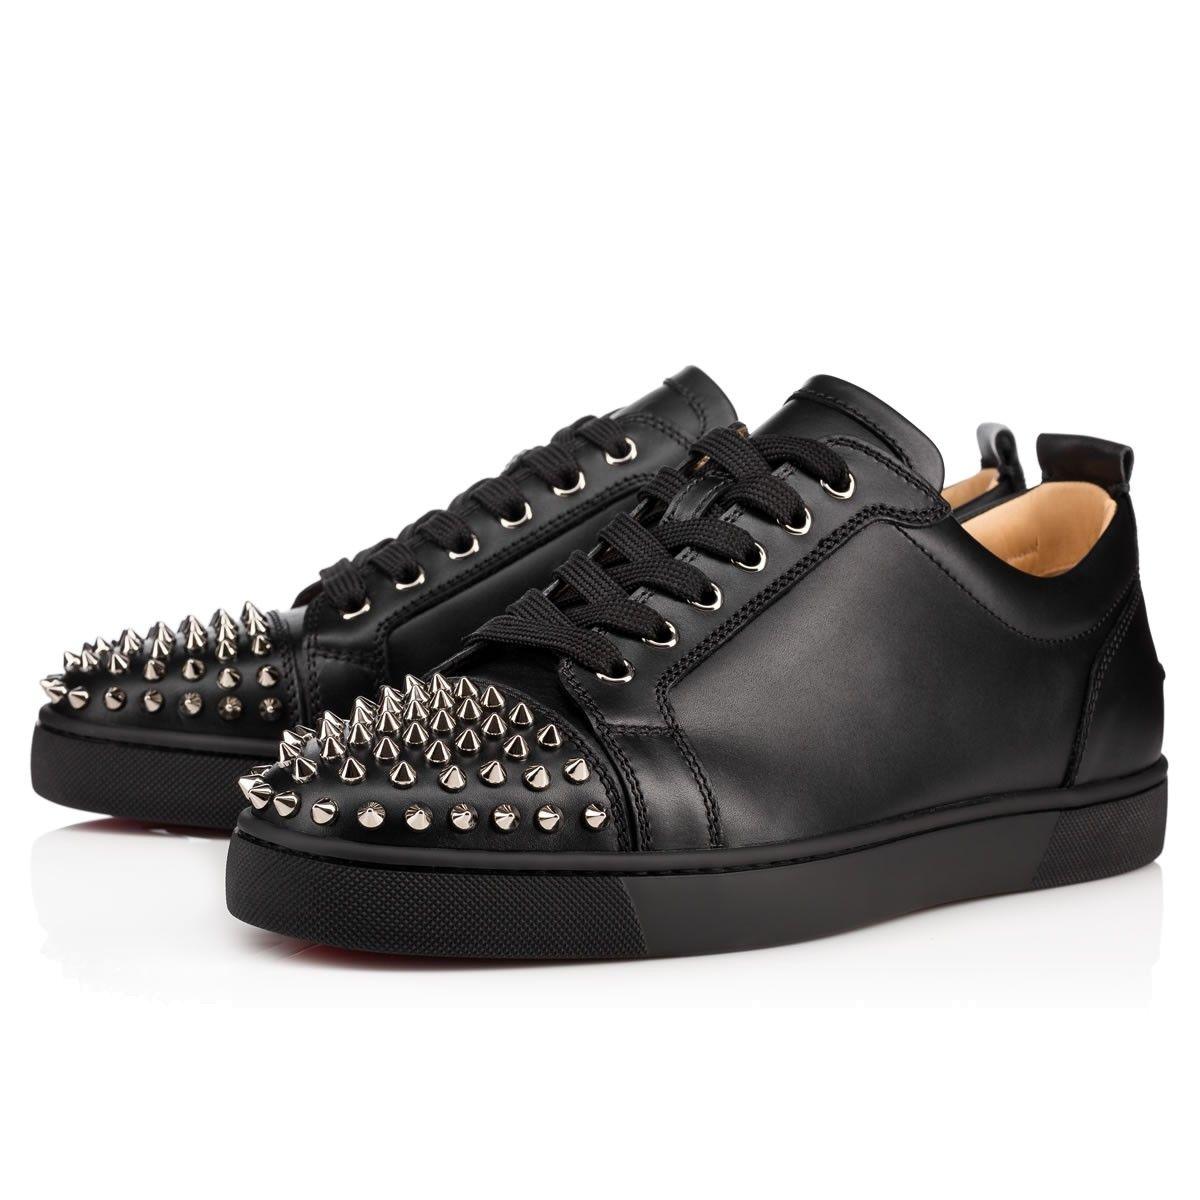 Louis Junior Spikes Flat Black/Gun Calf - Men Shoes - Christian Louboutin